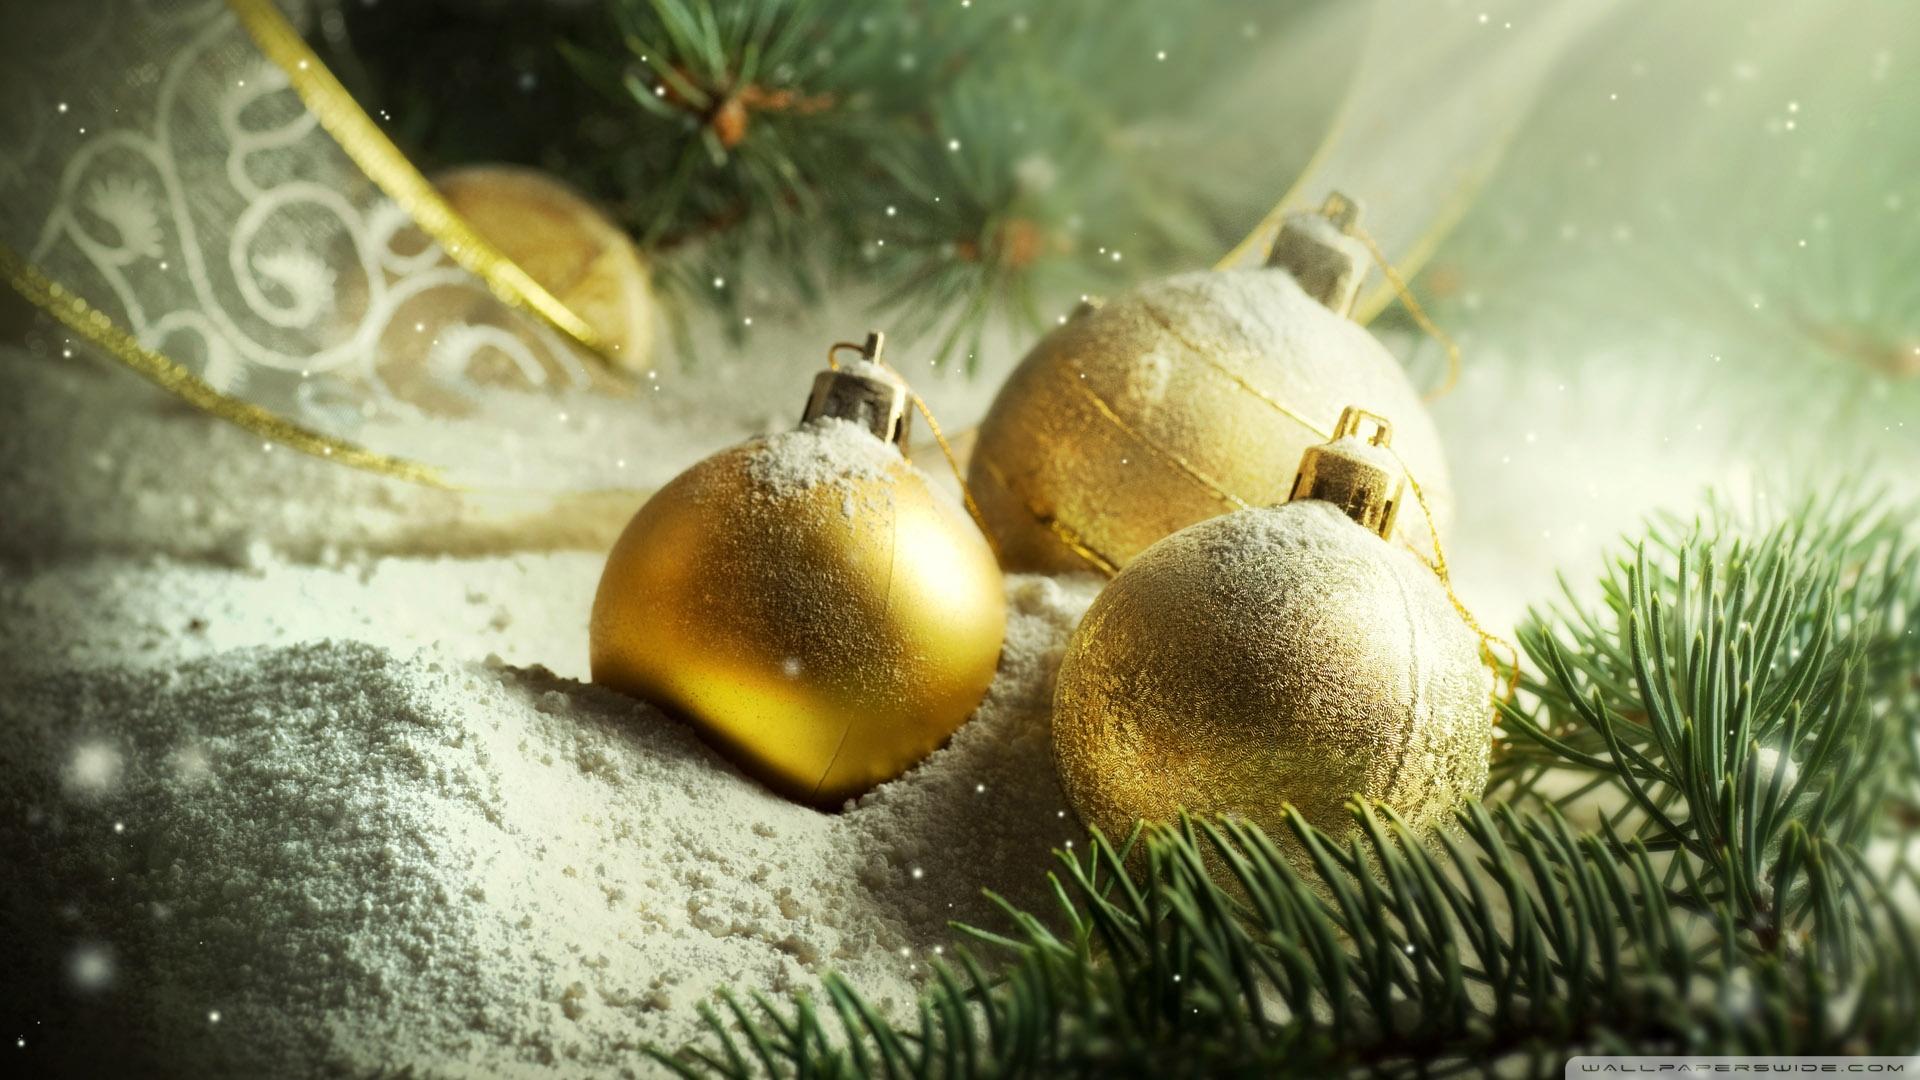 Jesus Outdoor Christmas Decorations